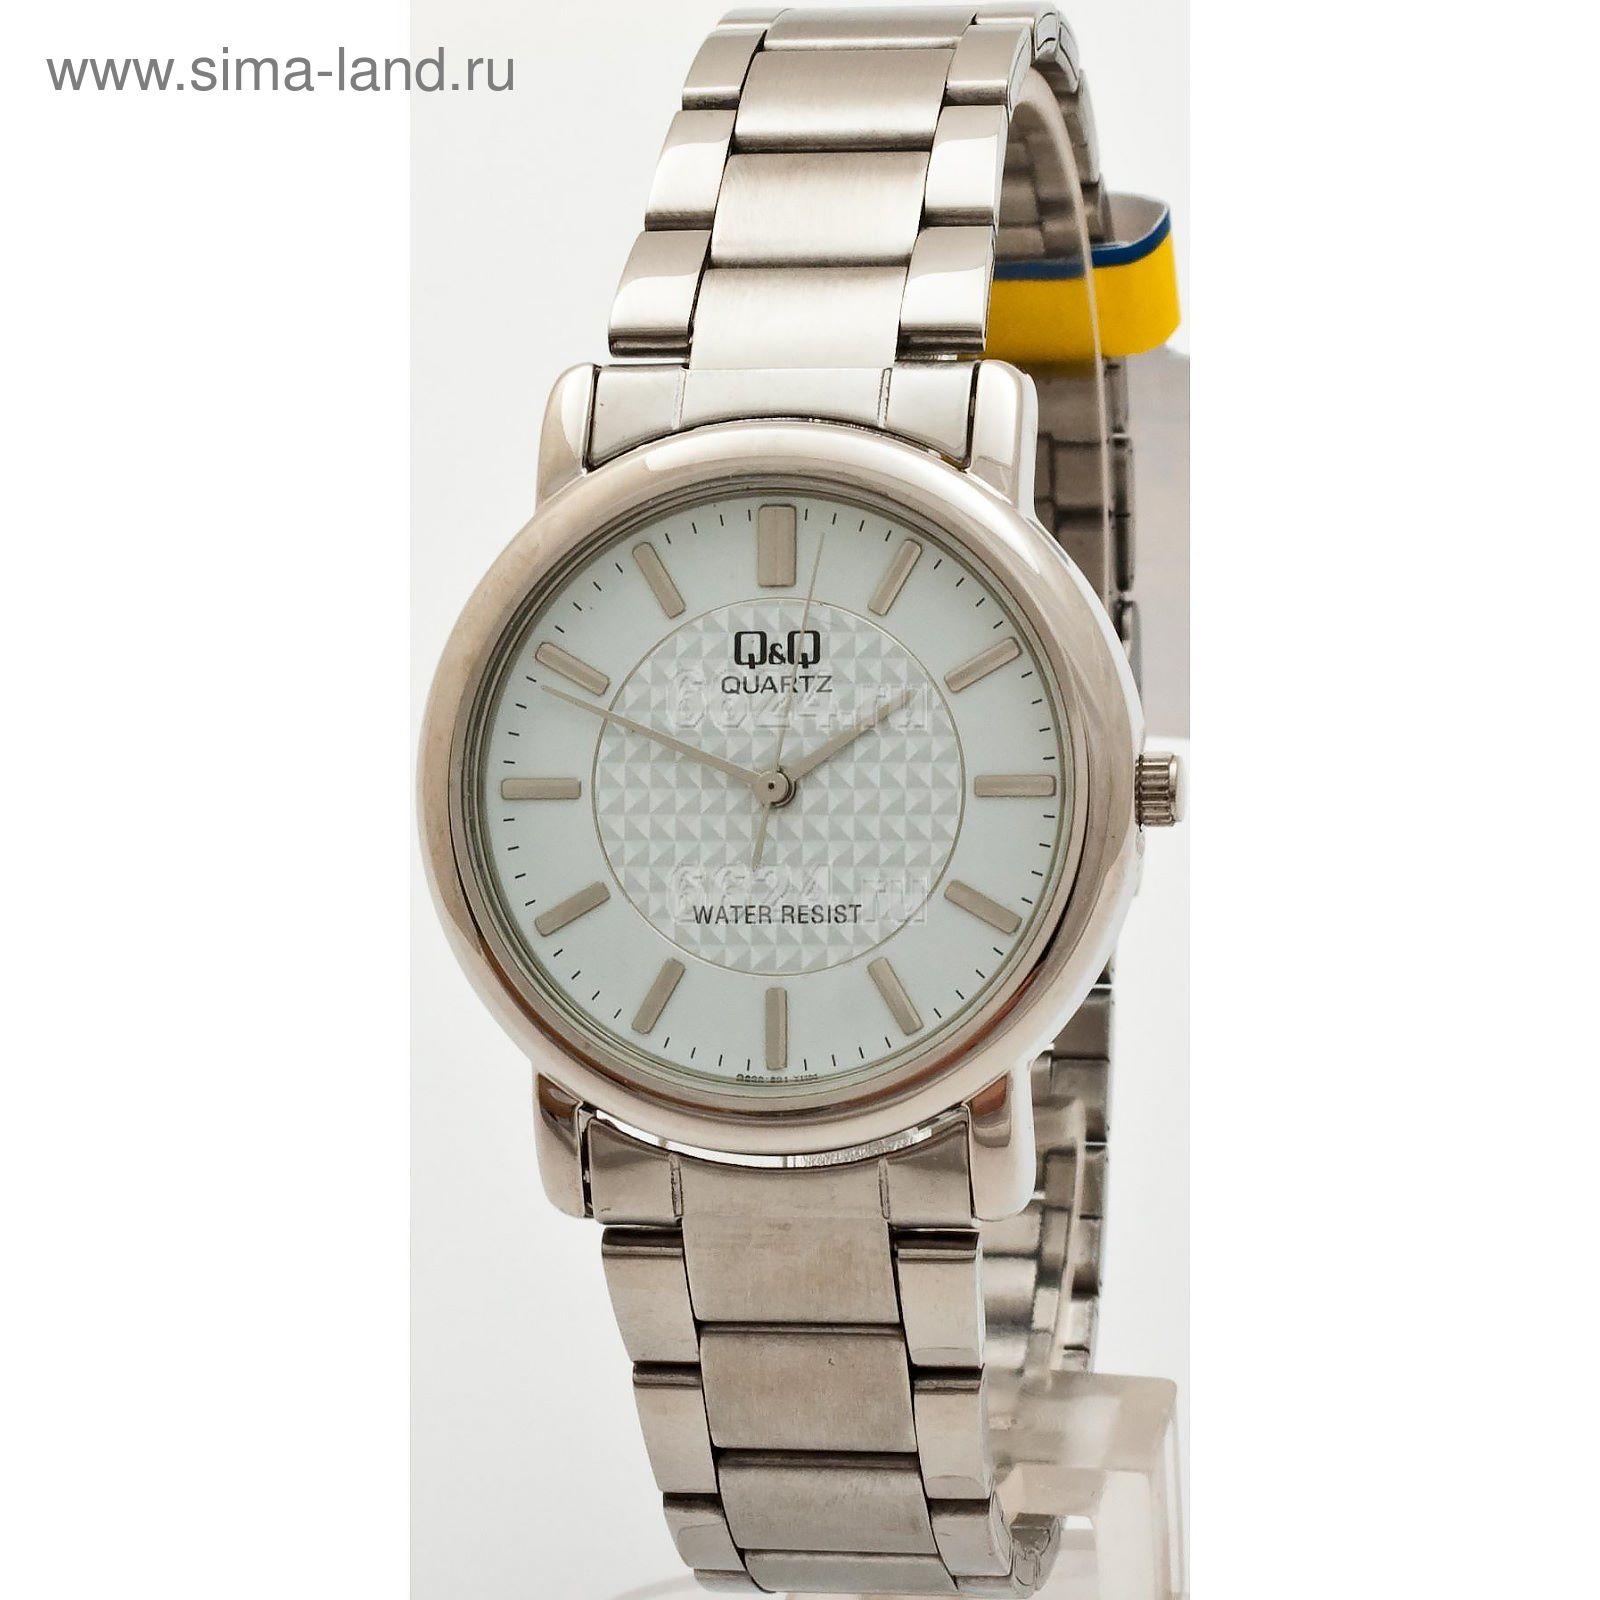 4e4d581e Часы наручные мужские Q&Q Q600-201 (1589393) - Купить по цене от ...